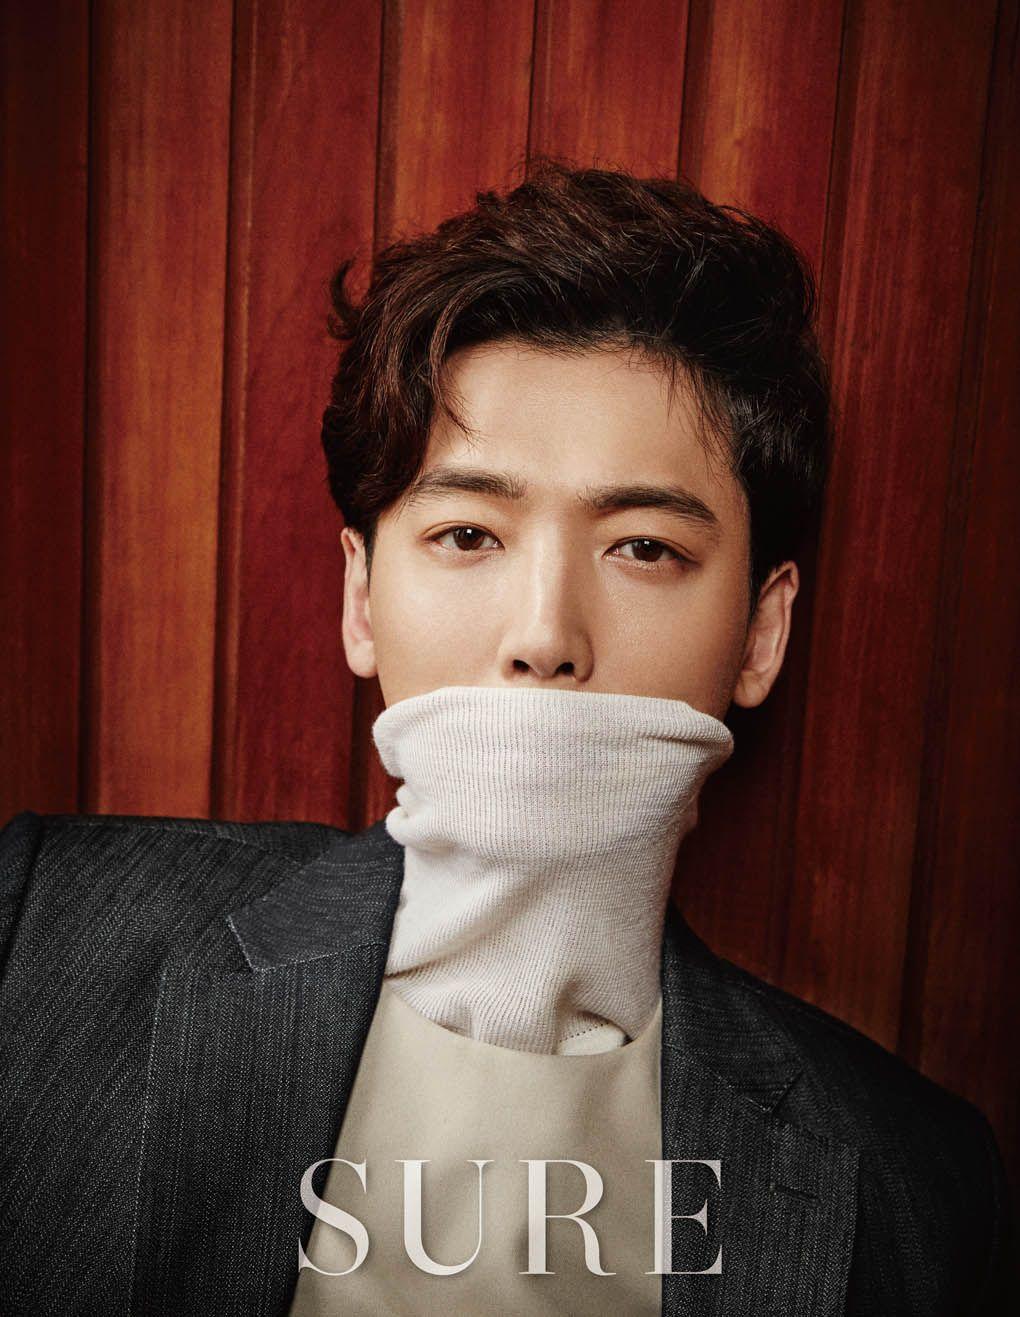 Jung Kyoung Ho | Jung Kyung Ho | 정경호 | D.O.B 31/8/1983 (Aries)